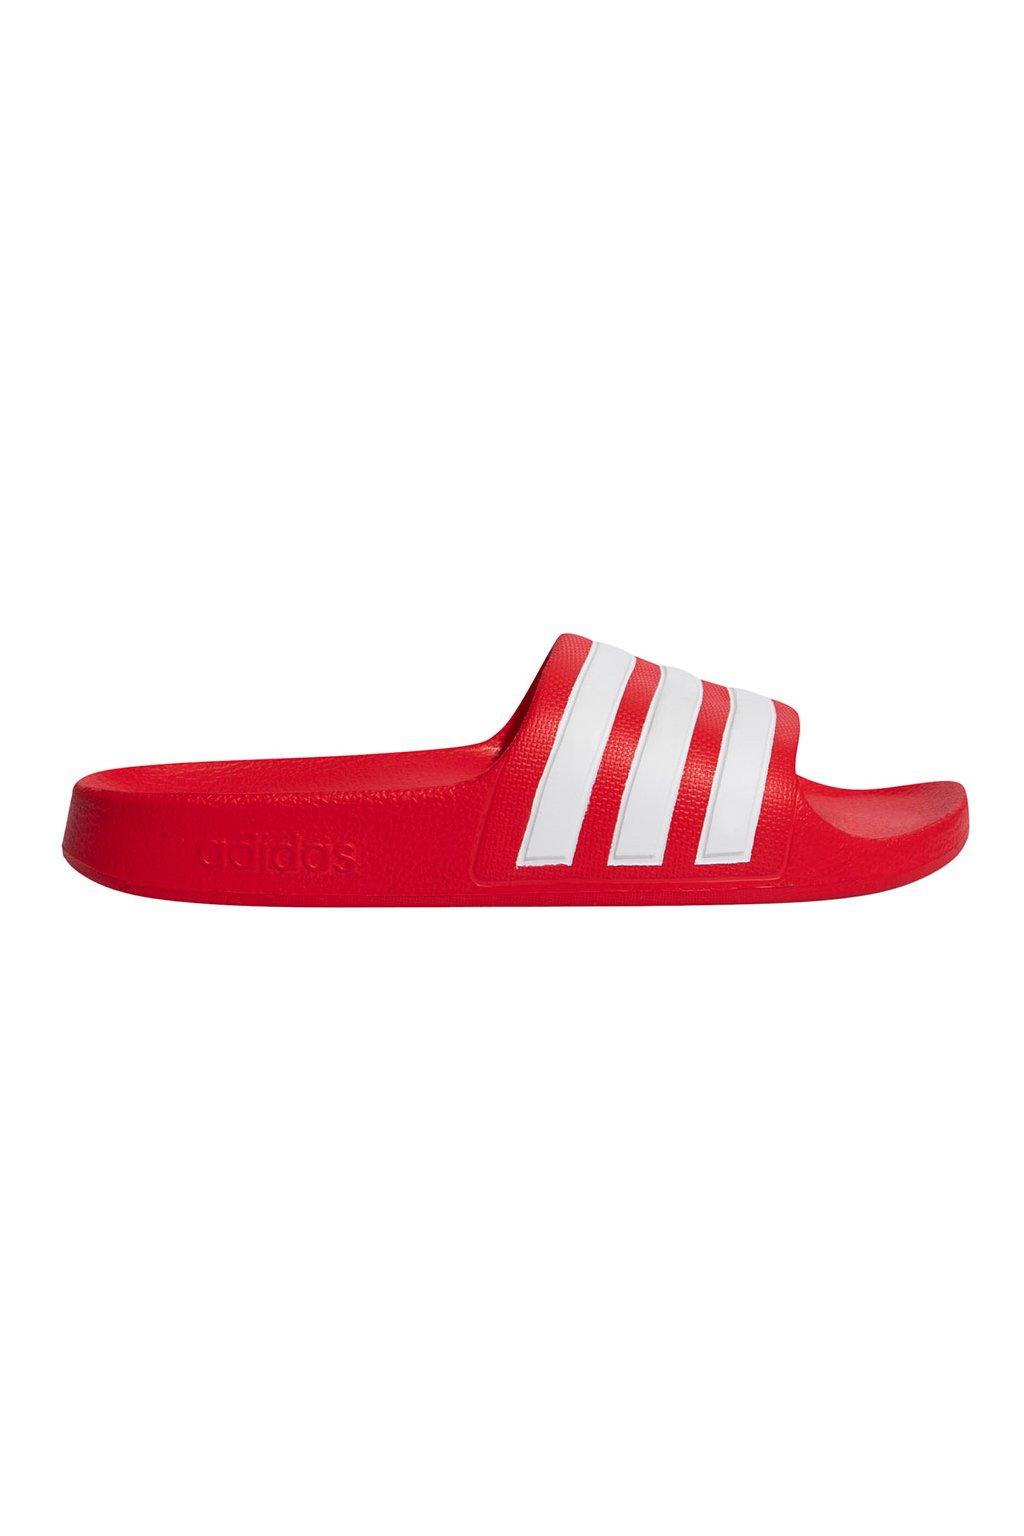 Detské šľapky adidas Adilette Aqua červené FY8066